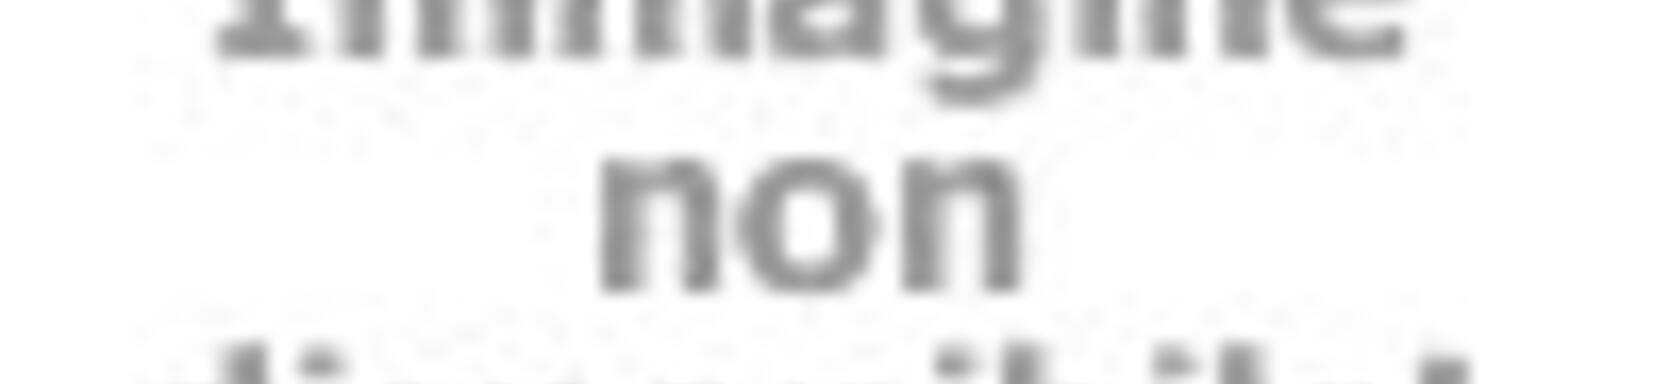 basketriminicrabs it 6-2725-video-eybl-u14-ii-tappa-intervista-rubin-stefanov 003